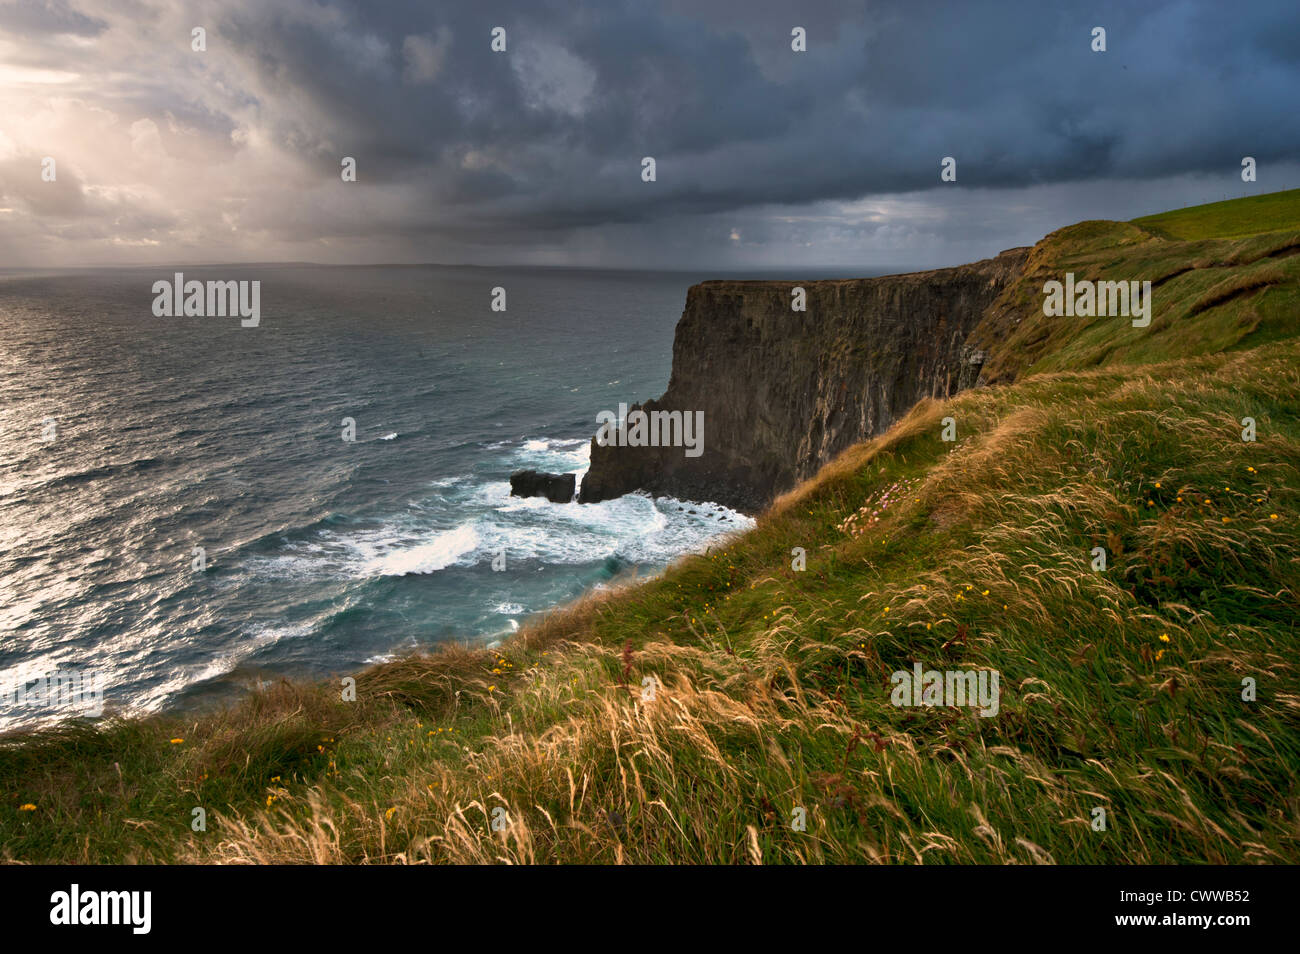 Tall grass growing on coastal cliffs - Stock Image